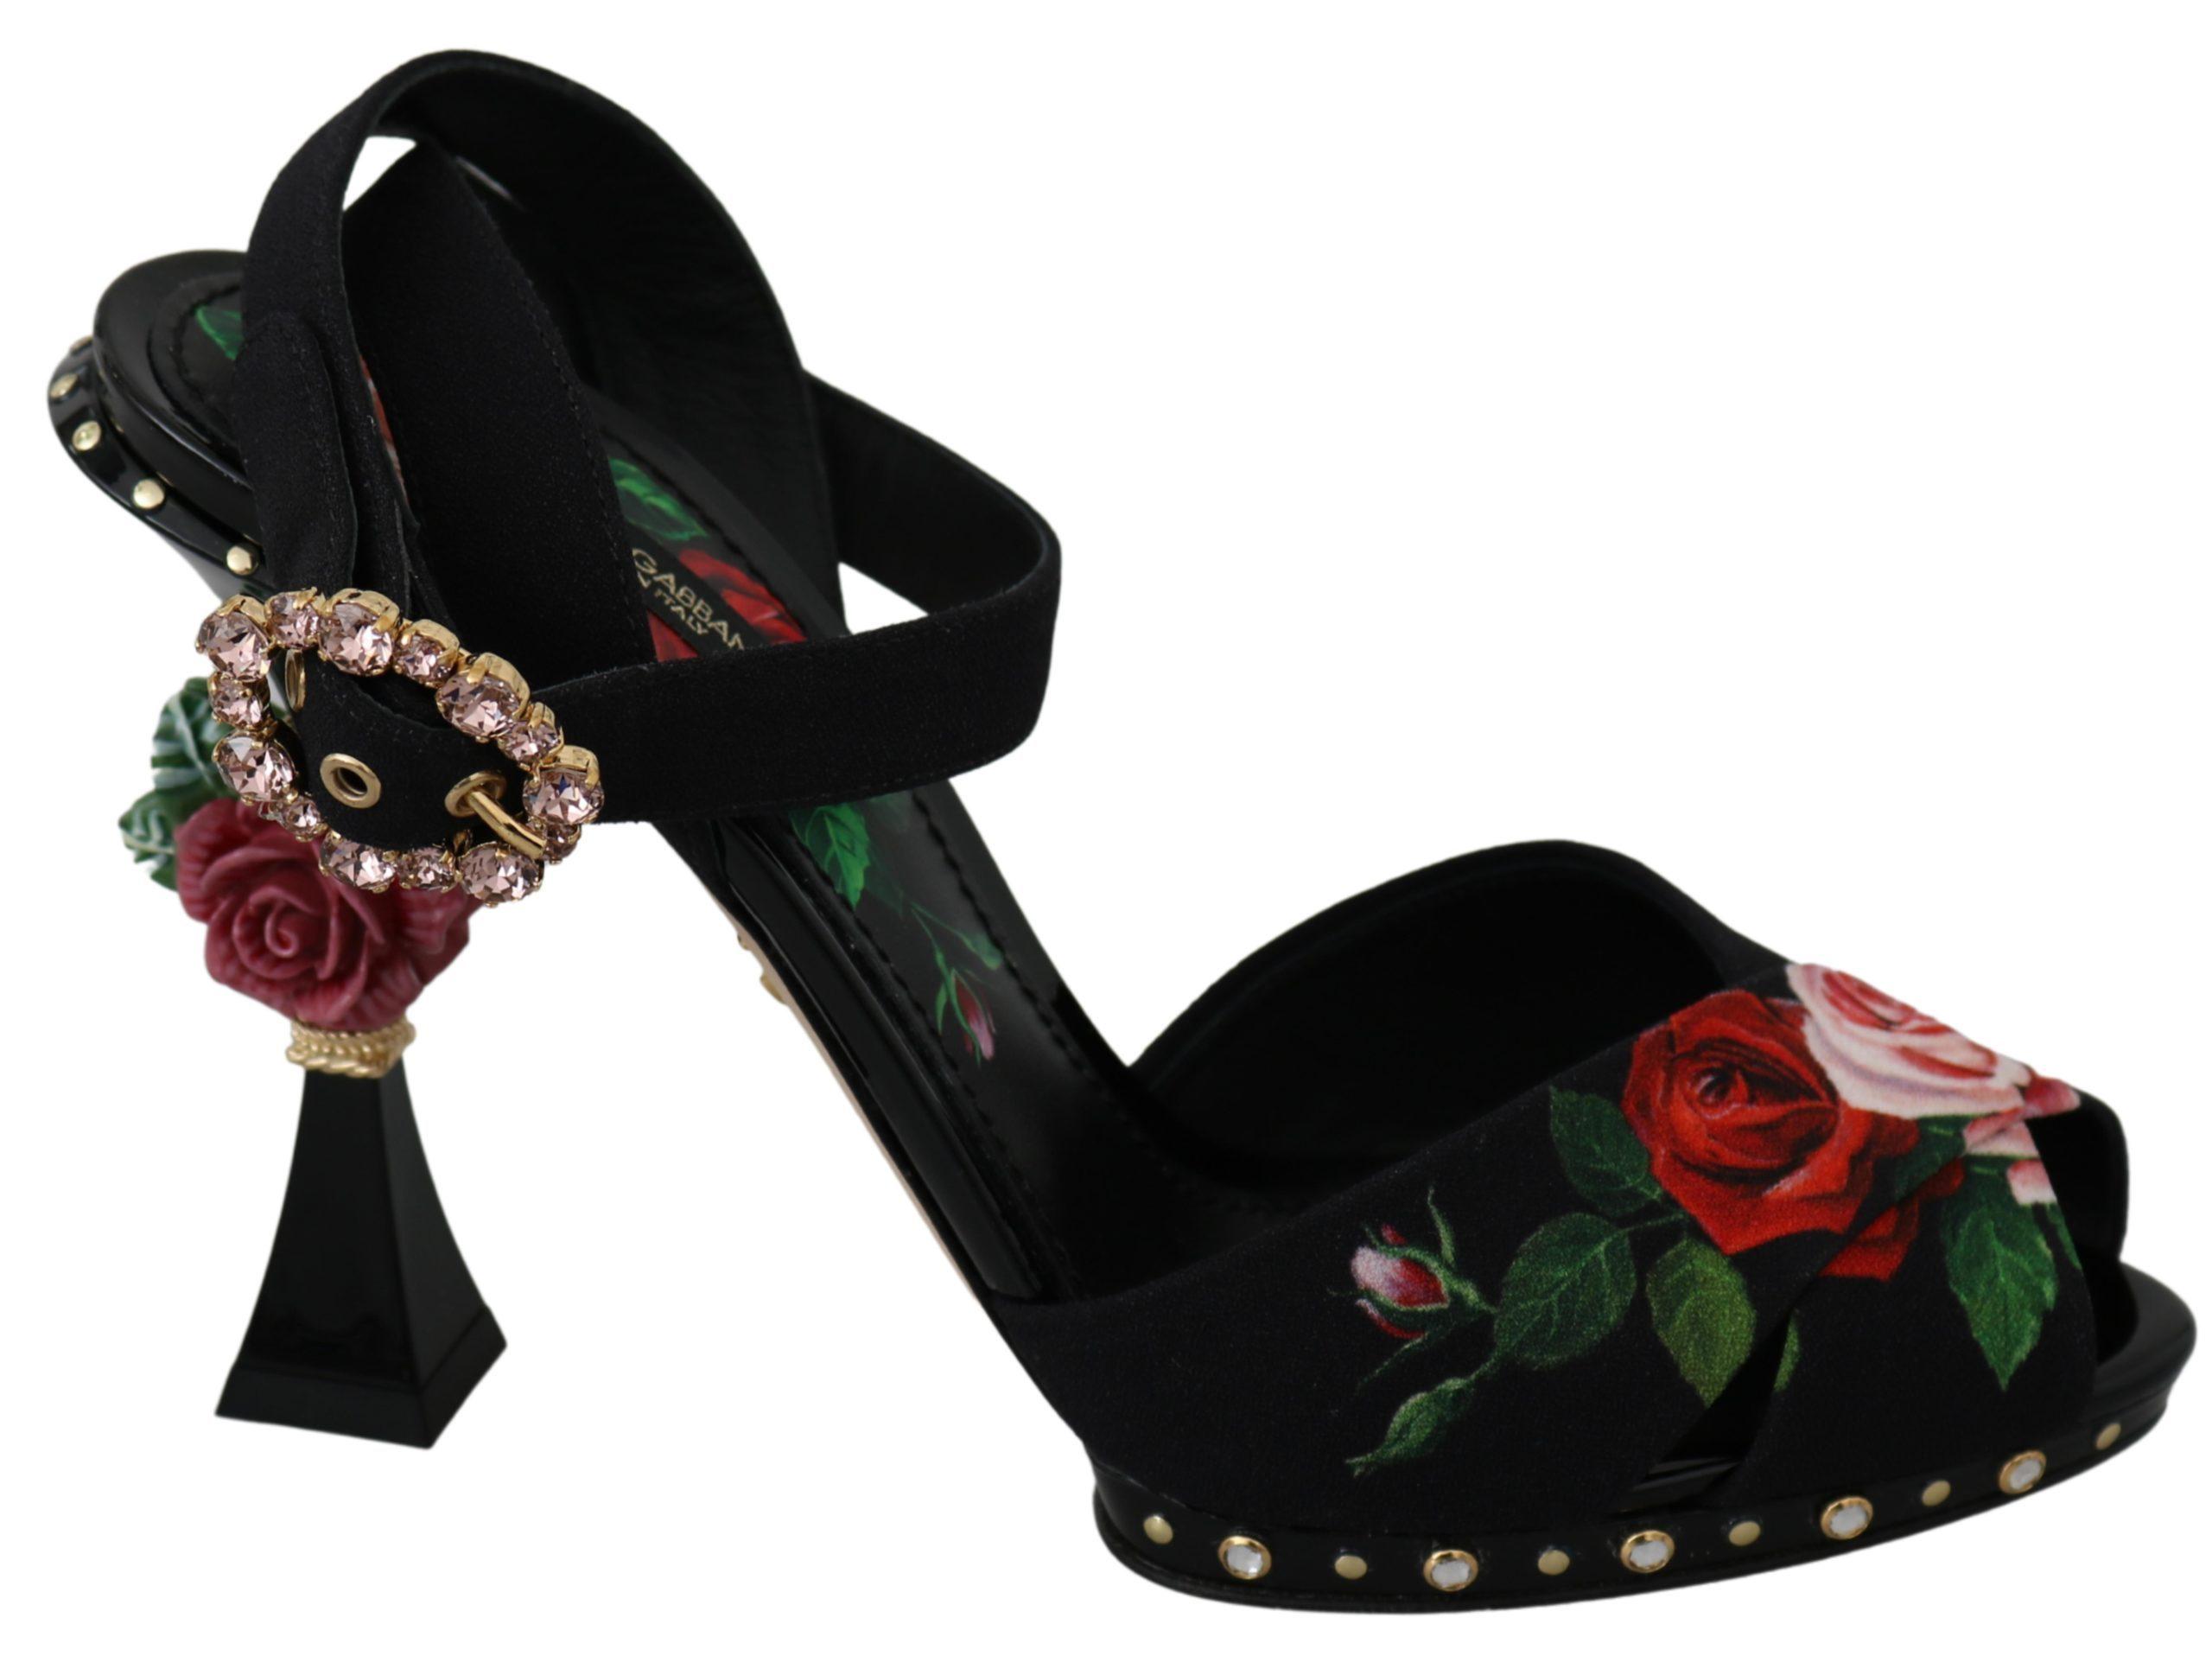 Black Sandals Roses Crystal Heels Shoes - EU38.5/US8